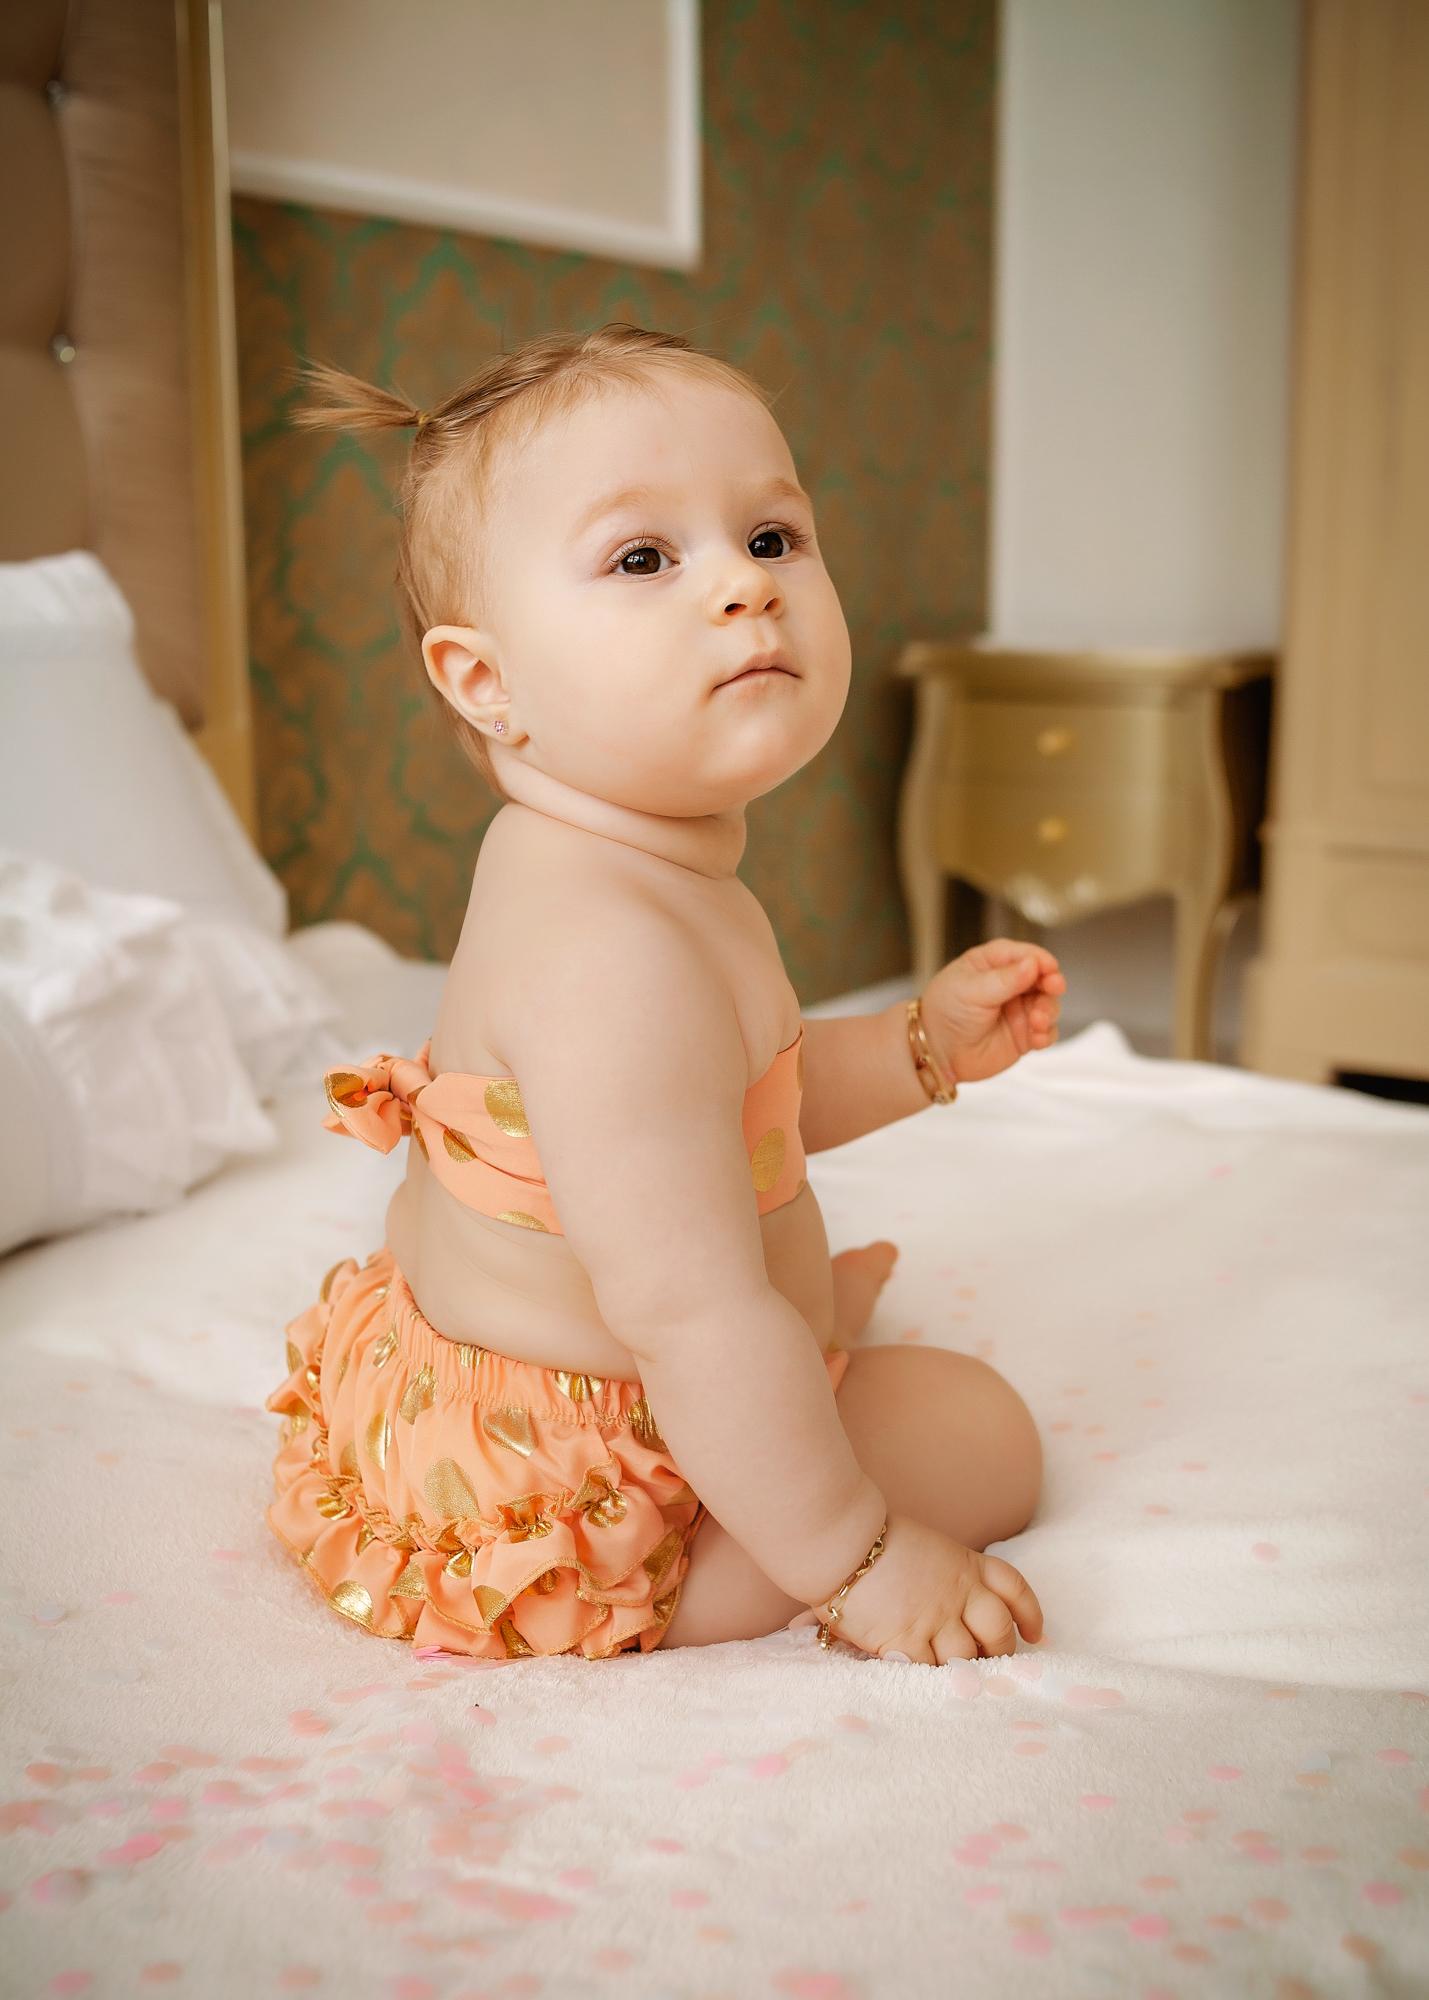 Baby Fotografie, Milestone Fotos